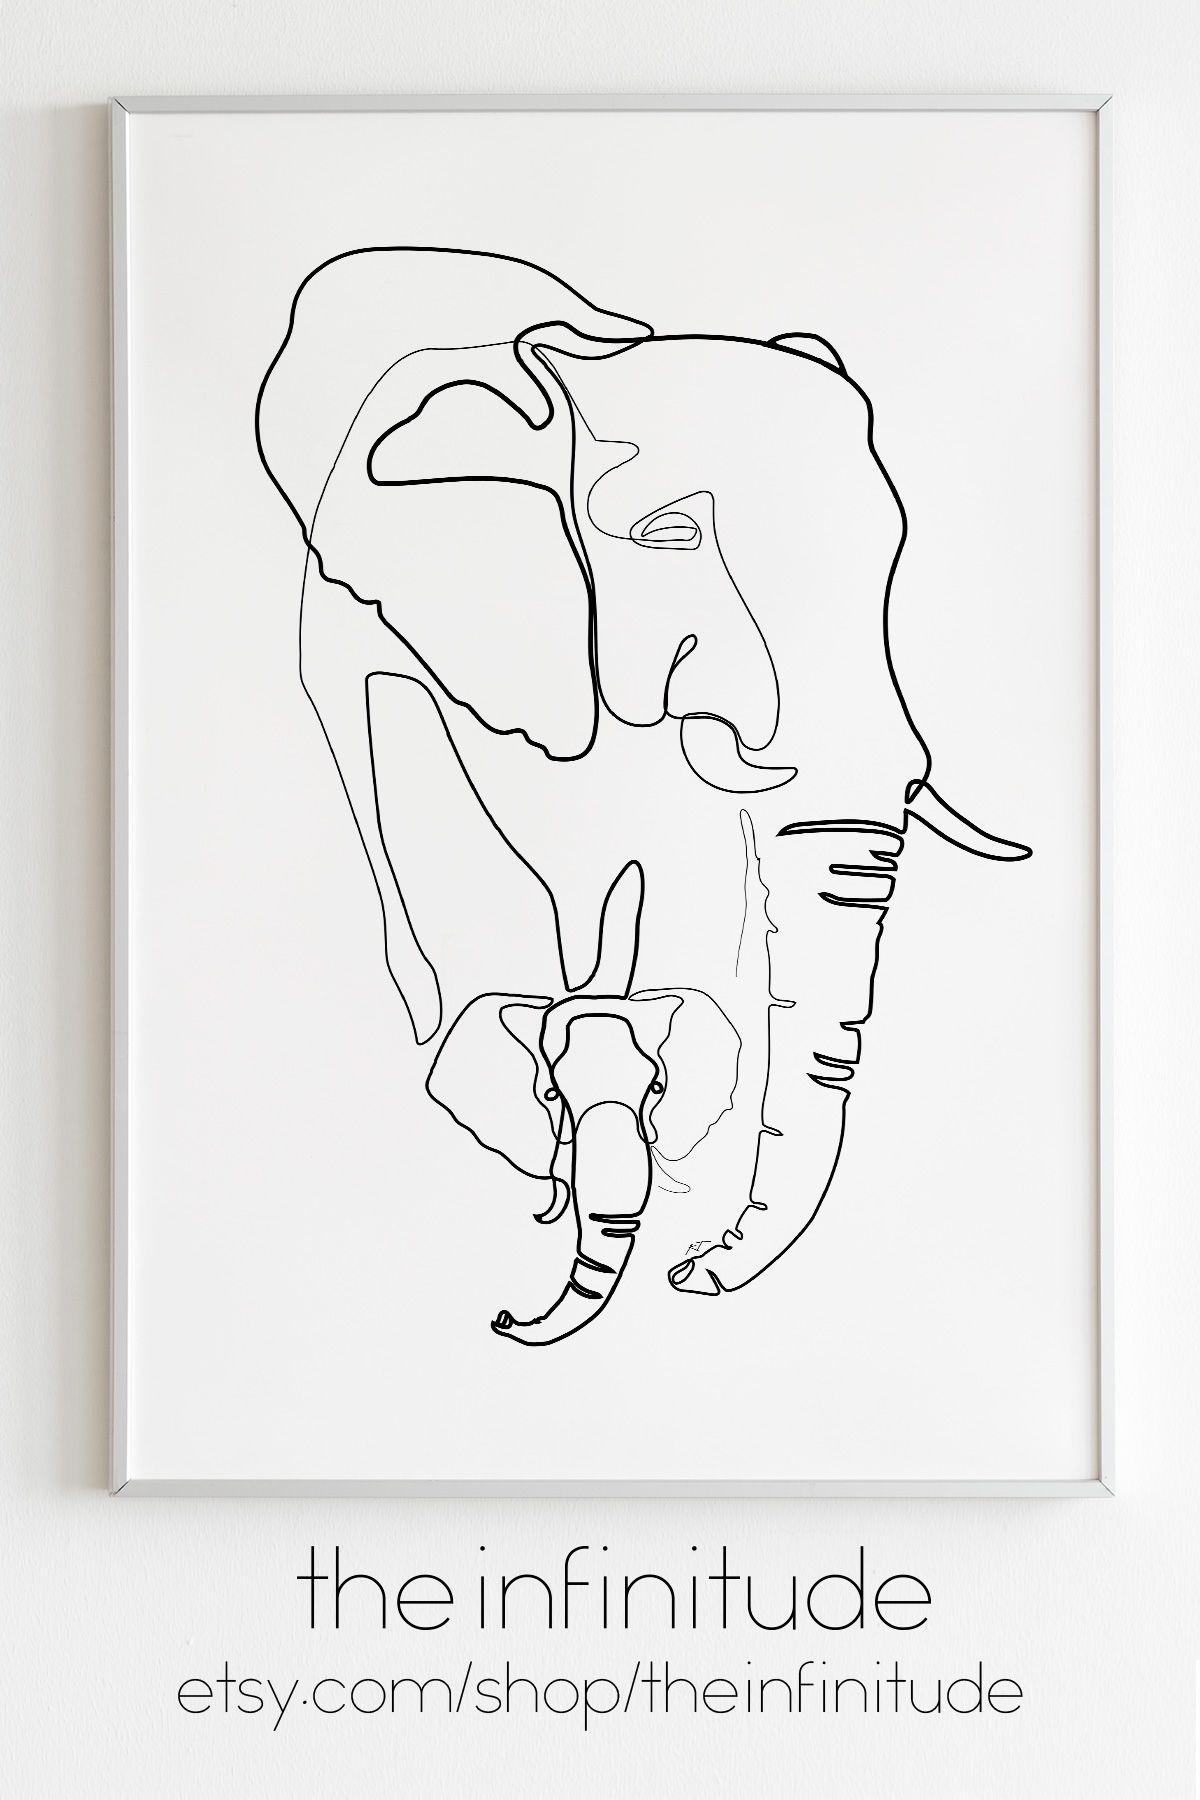 Minimalist Elephant Drawing: Boho Wall Decor Cuddling Couple Minimalist One Line